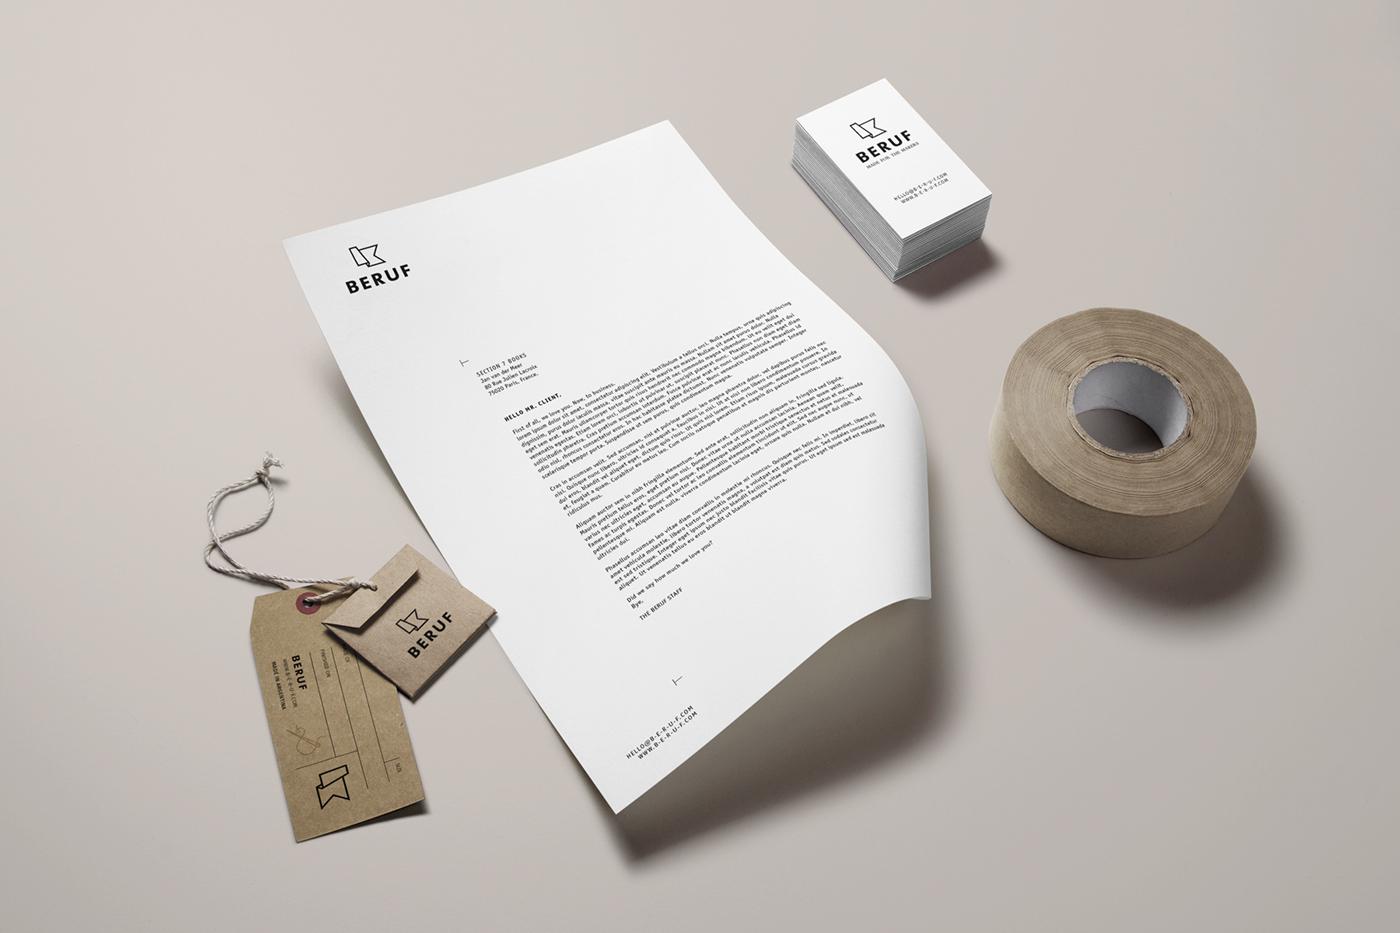 Beruf mftm goods craftsmanship metier products